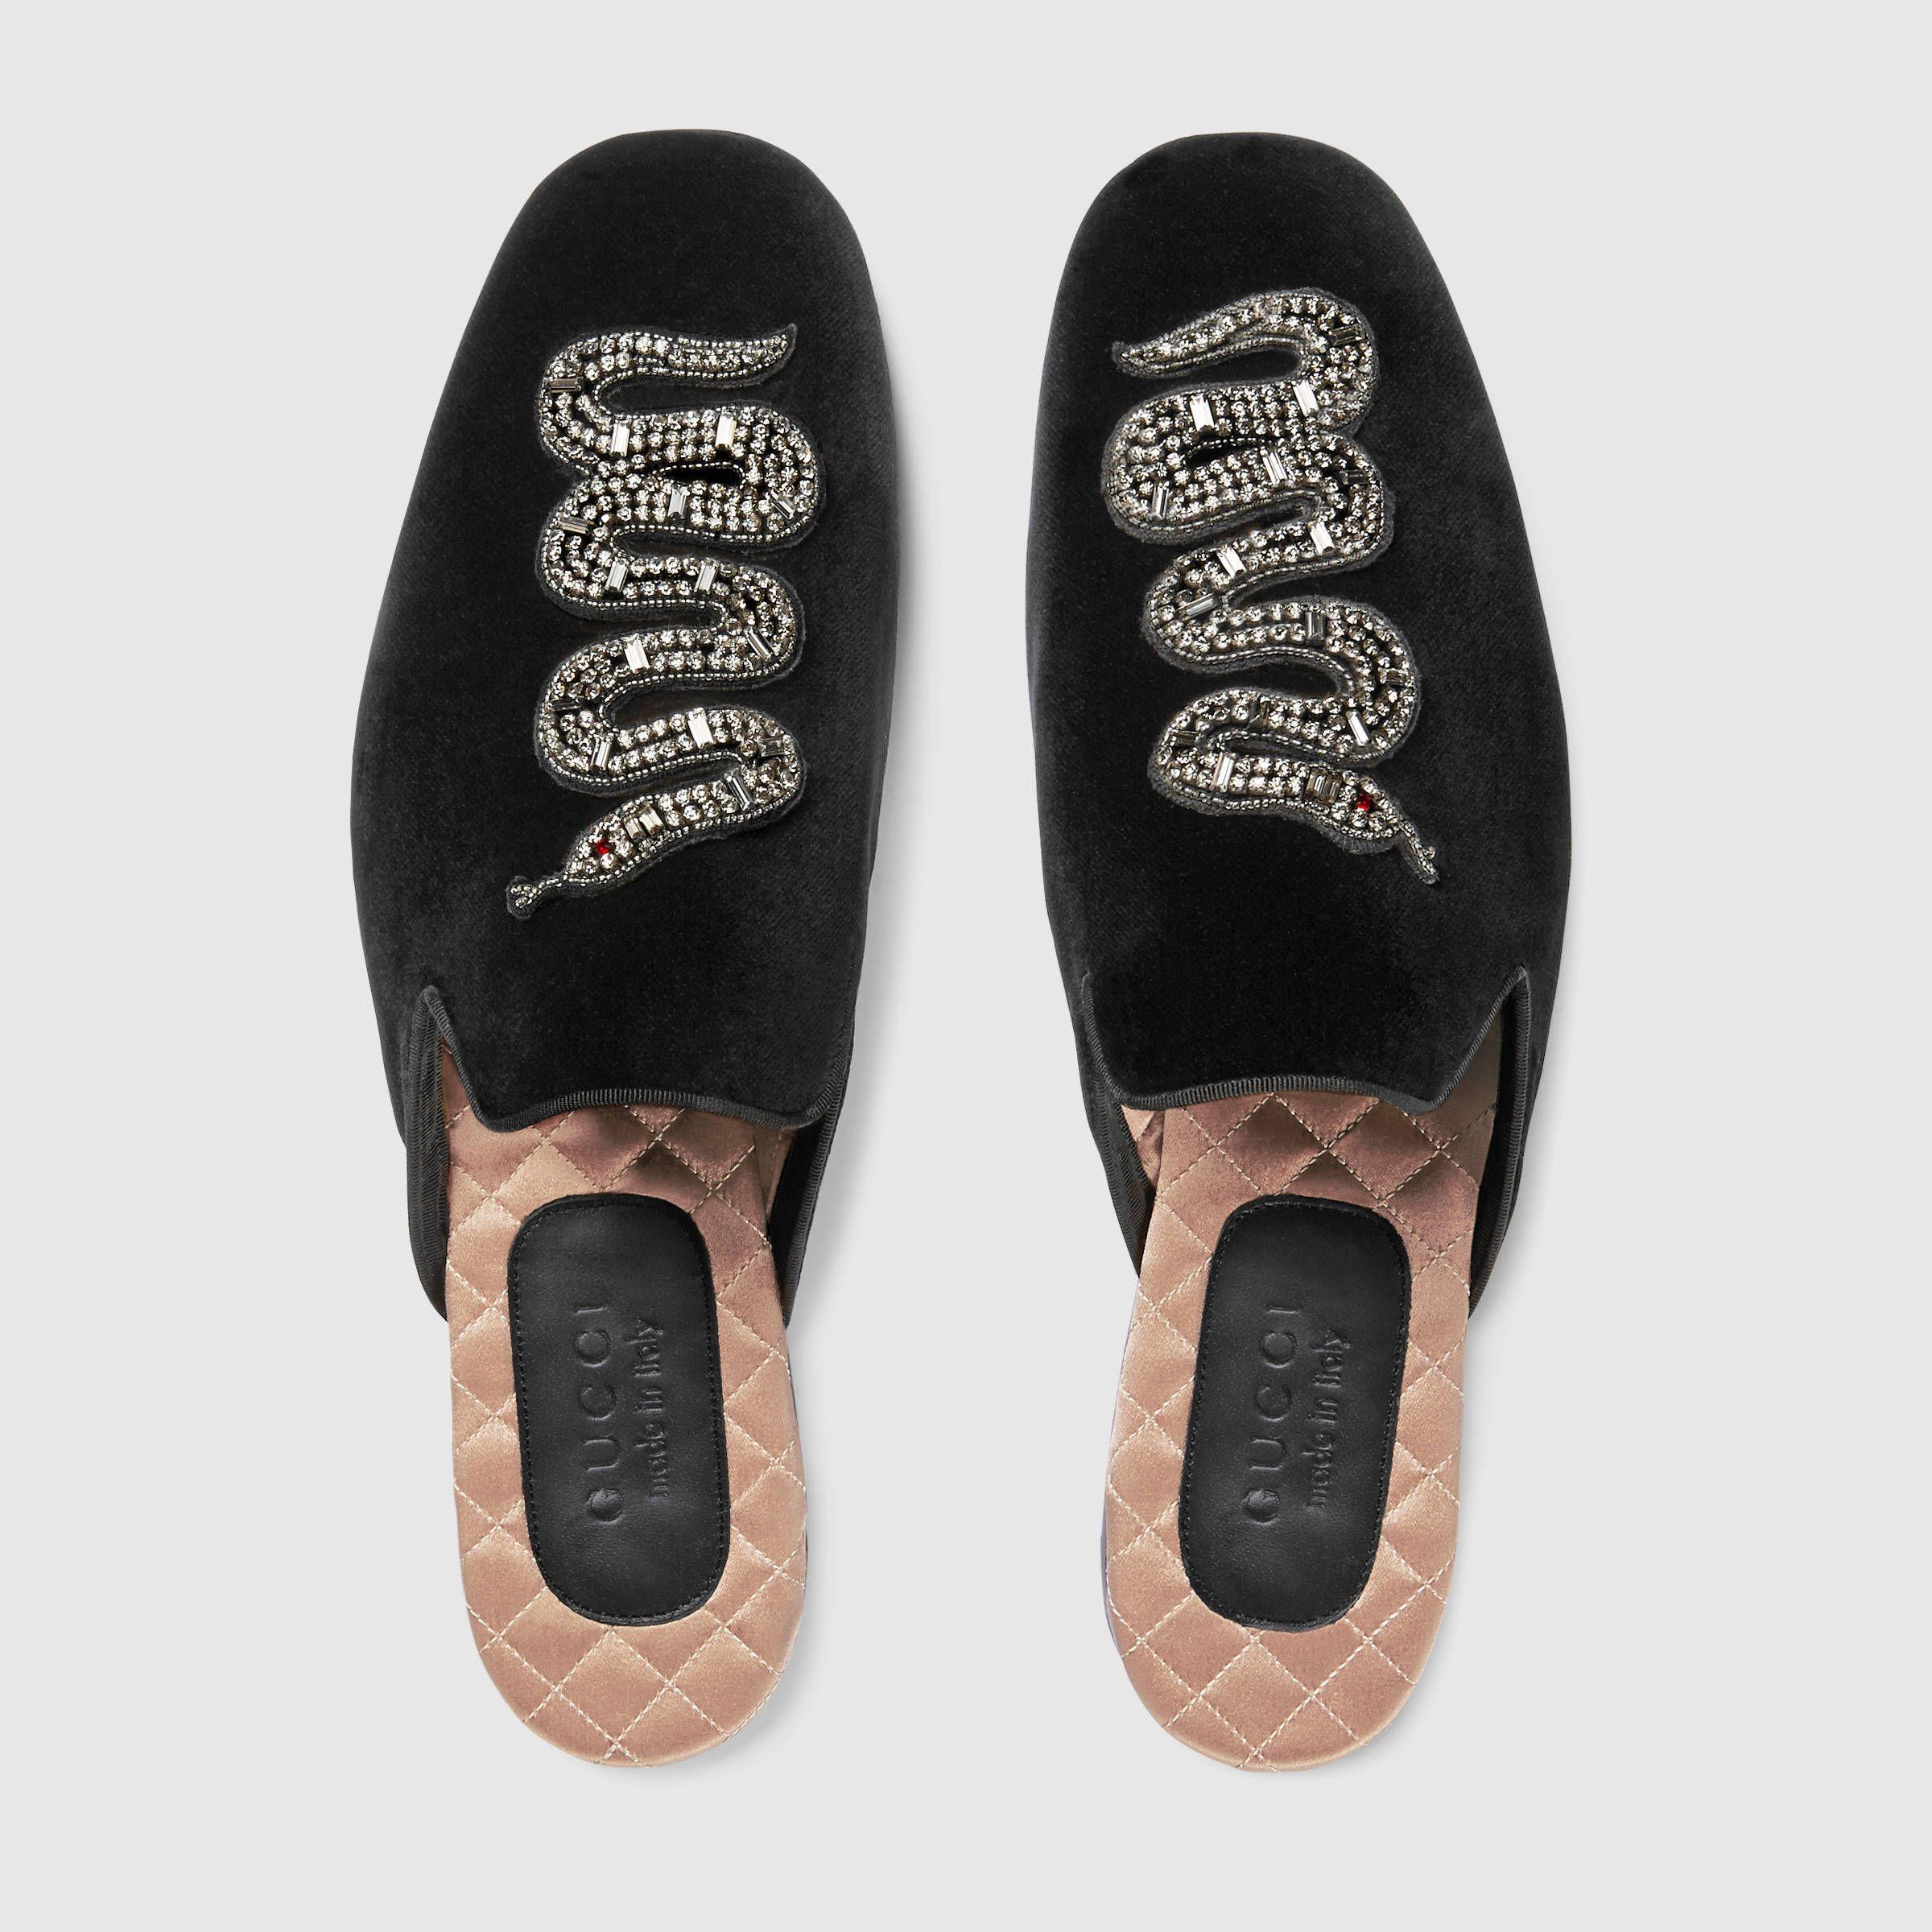 ff80cddcc4f Gucci Velvet evening slipper with snake Detail 3